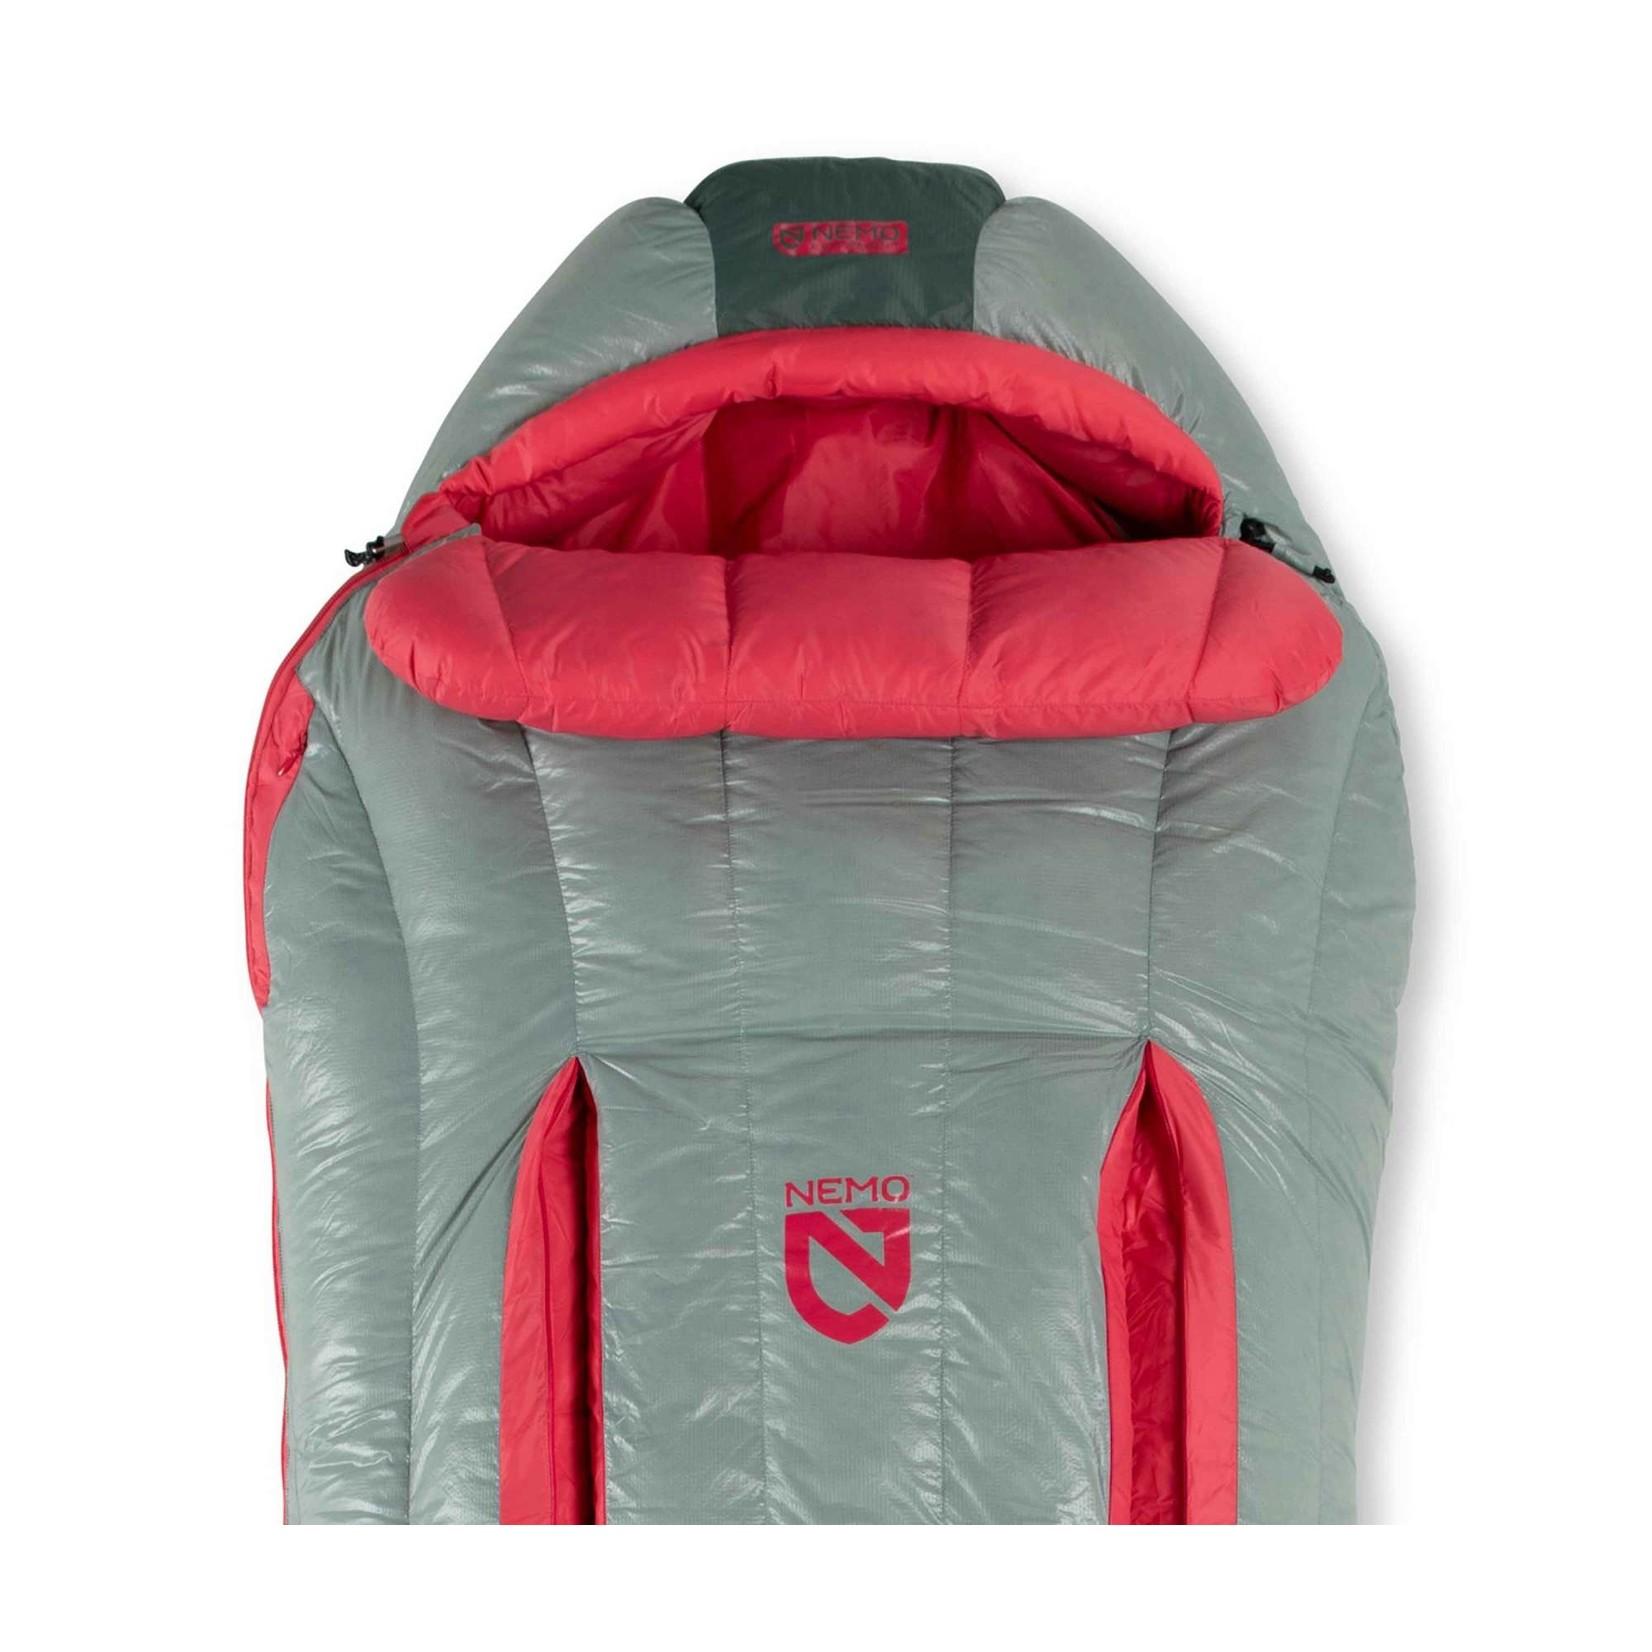 NEMO Riff™ women's down sleeping bag